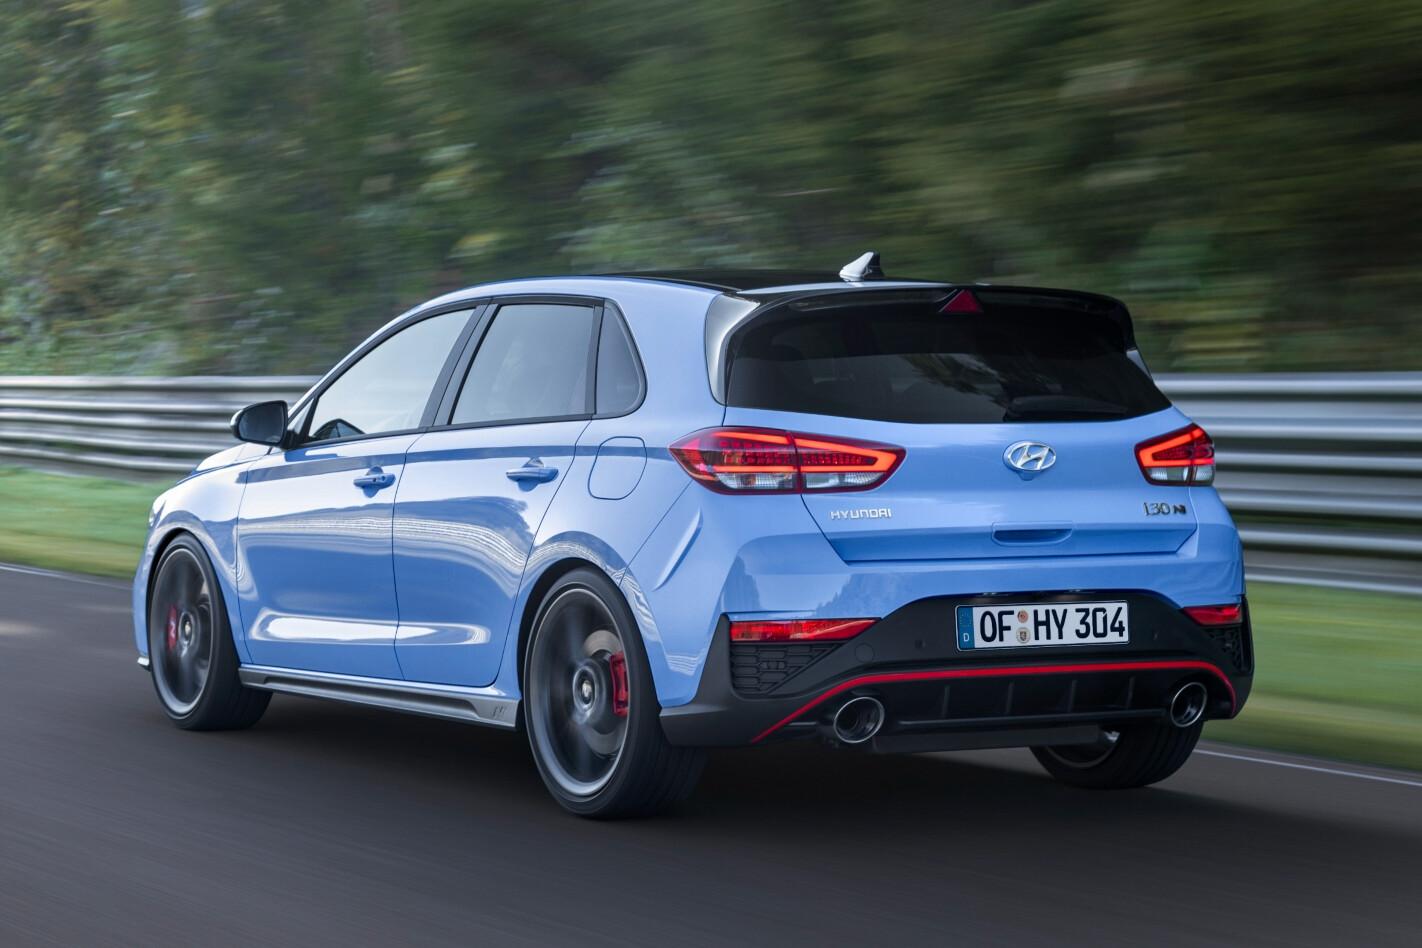 2021 Hyundai i30 N hatchback